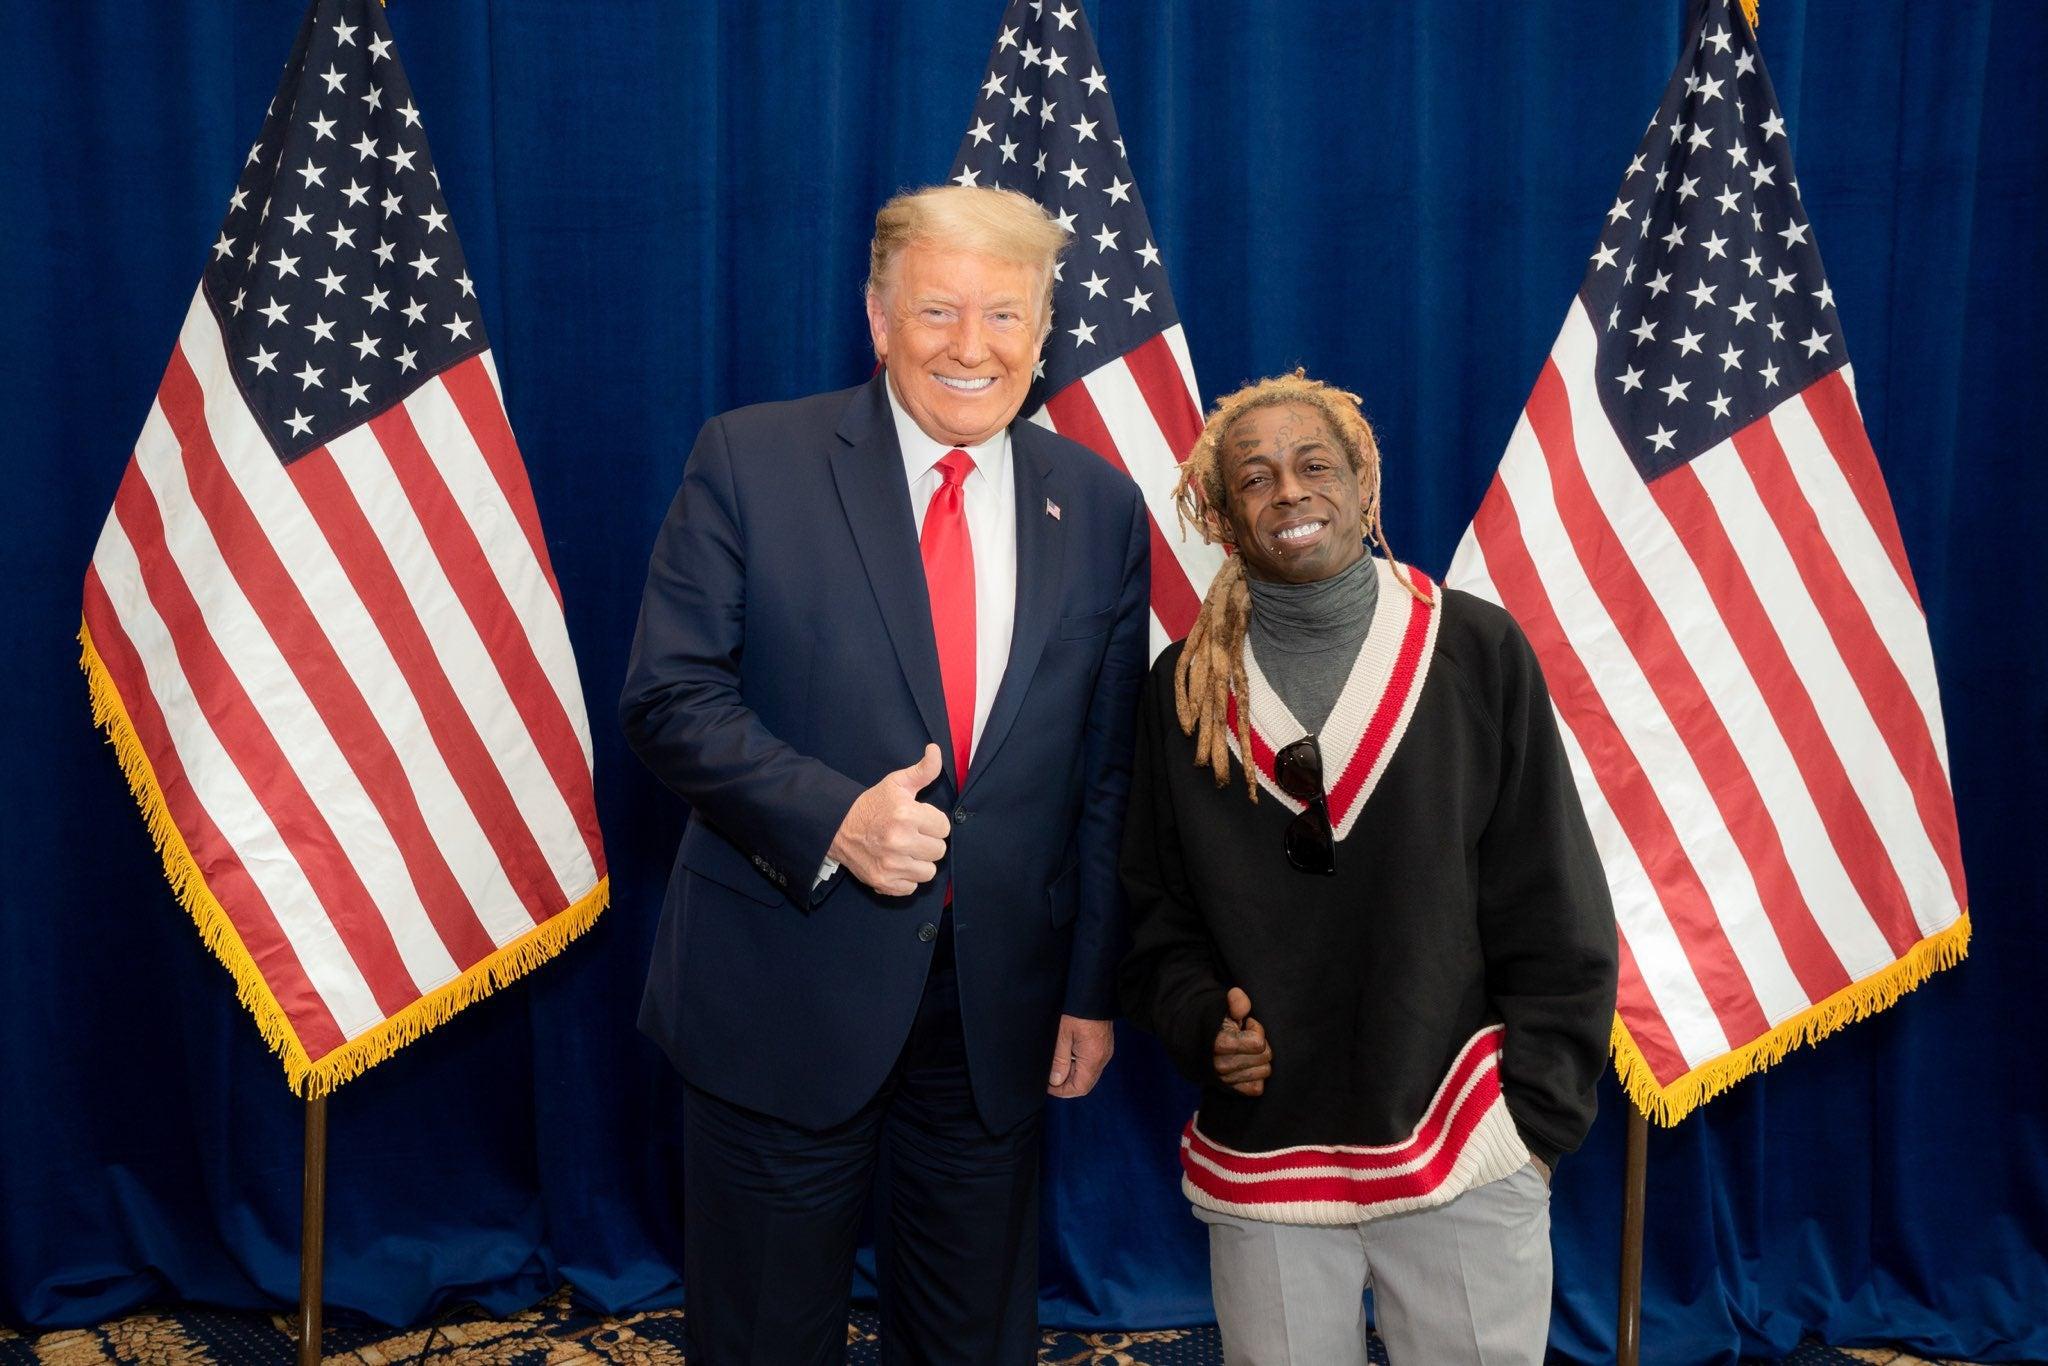 Lil Wayne And Kodak Black Granted Last-Minute Clemency By Donald Trump